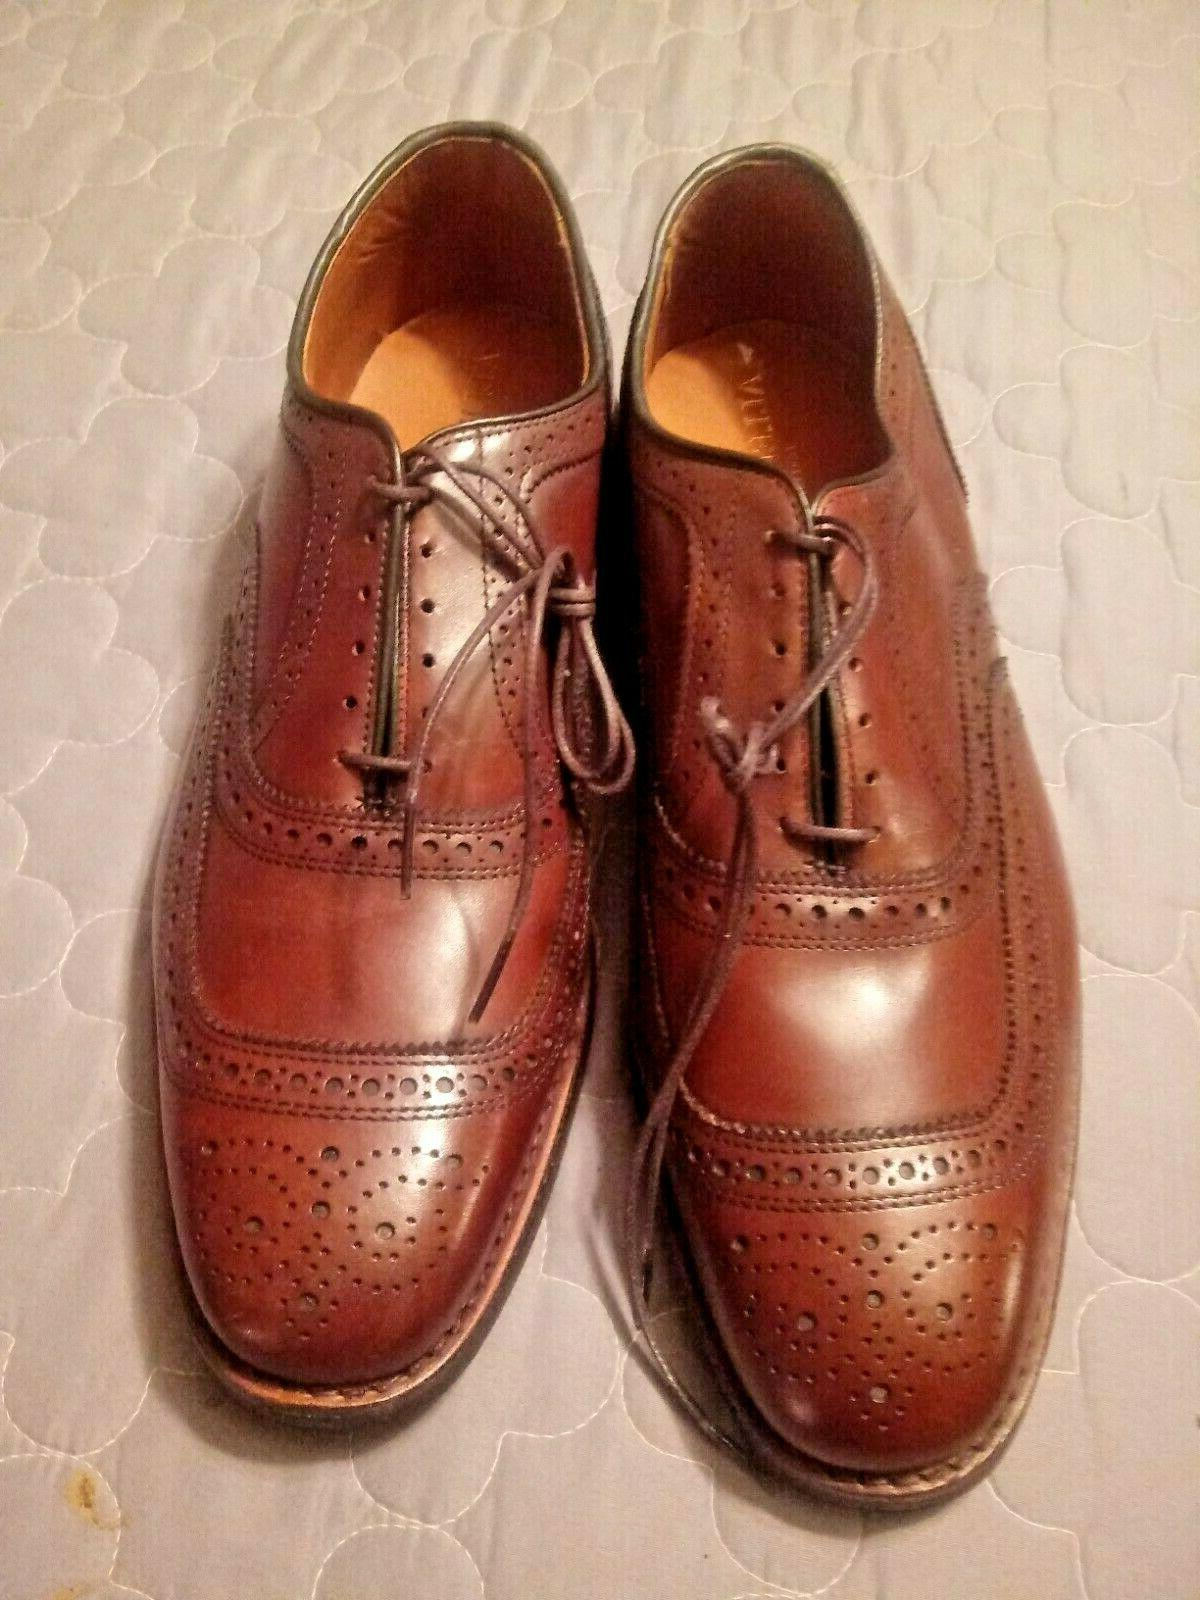 Allen University chili Dainite sole dress shoes